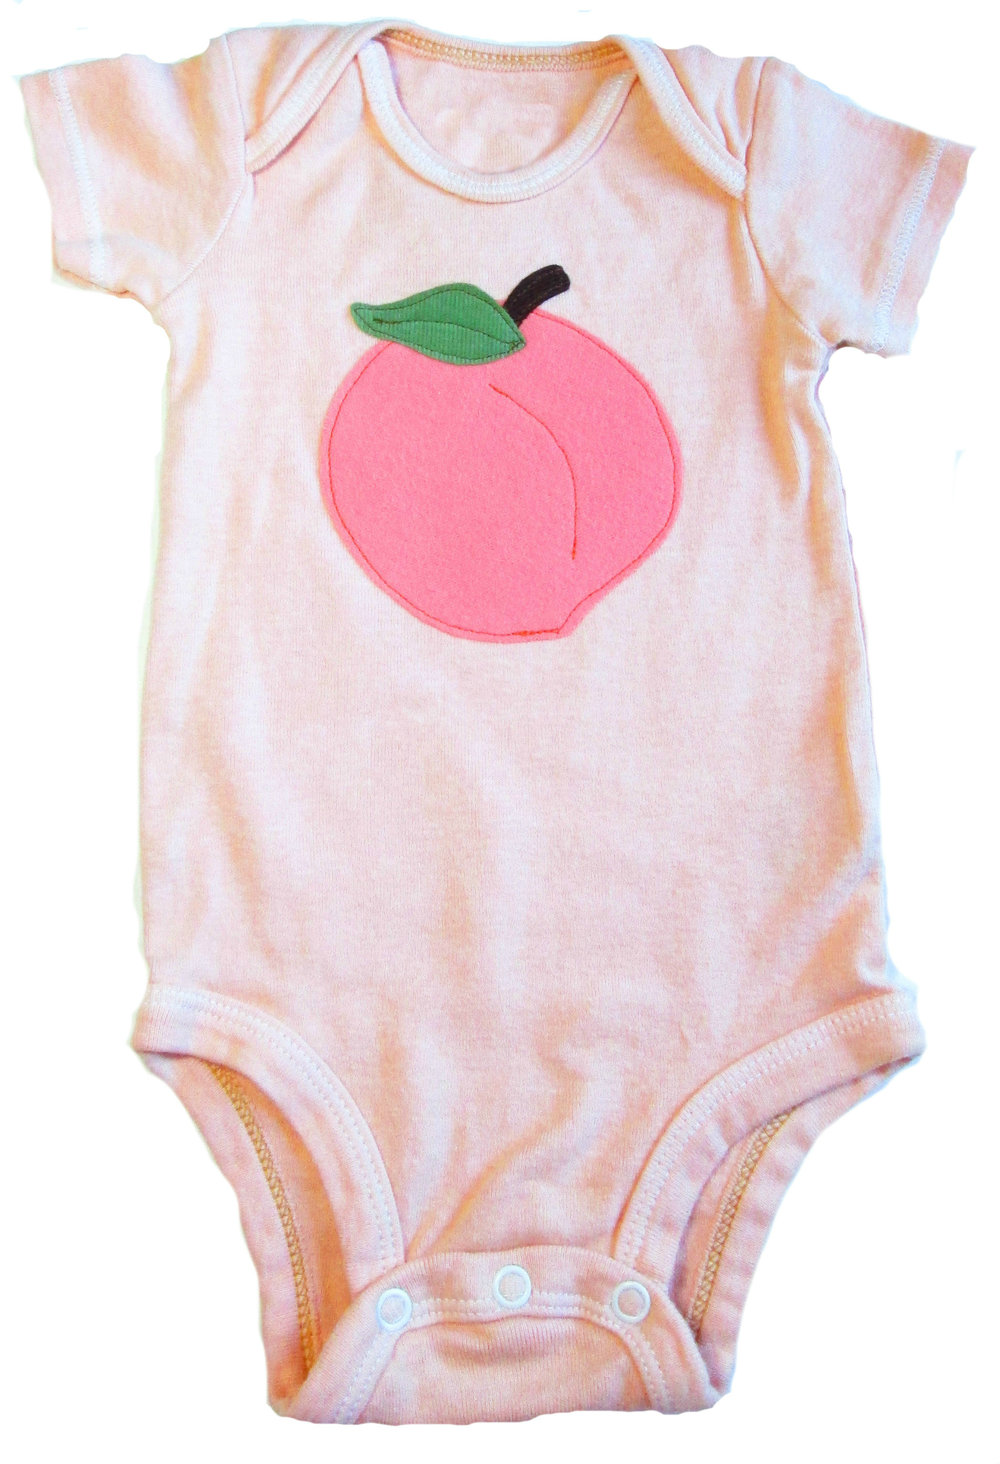 Humphrey.peach bodysuit.jpg